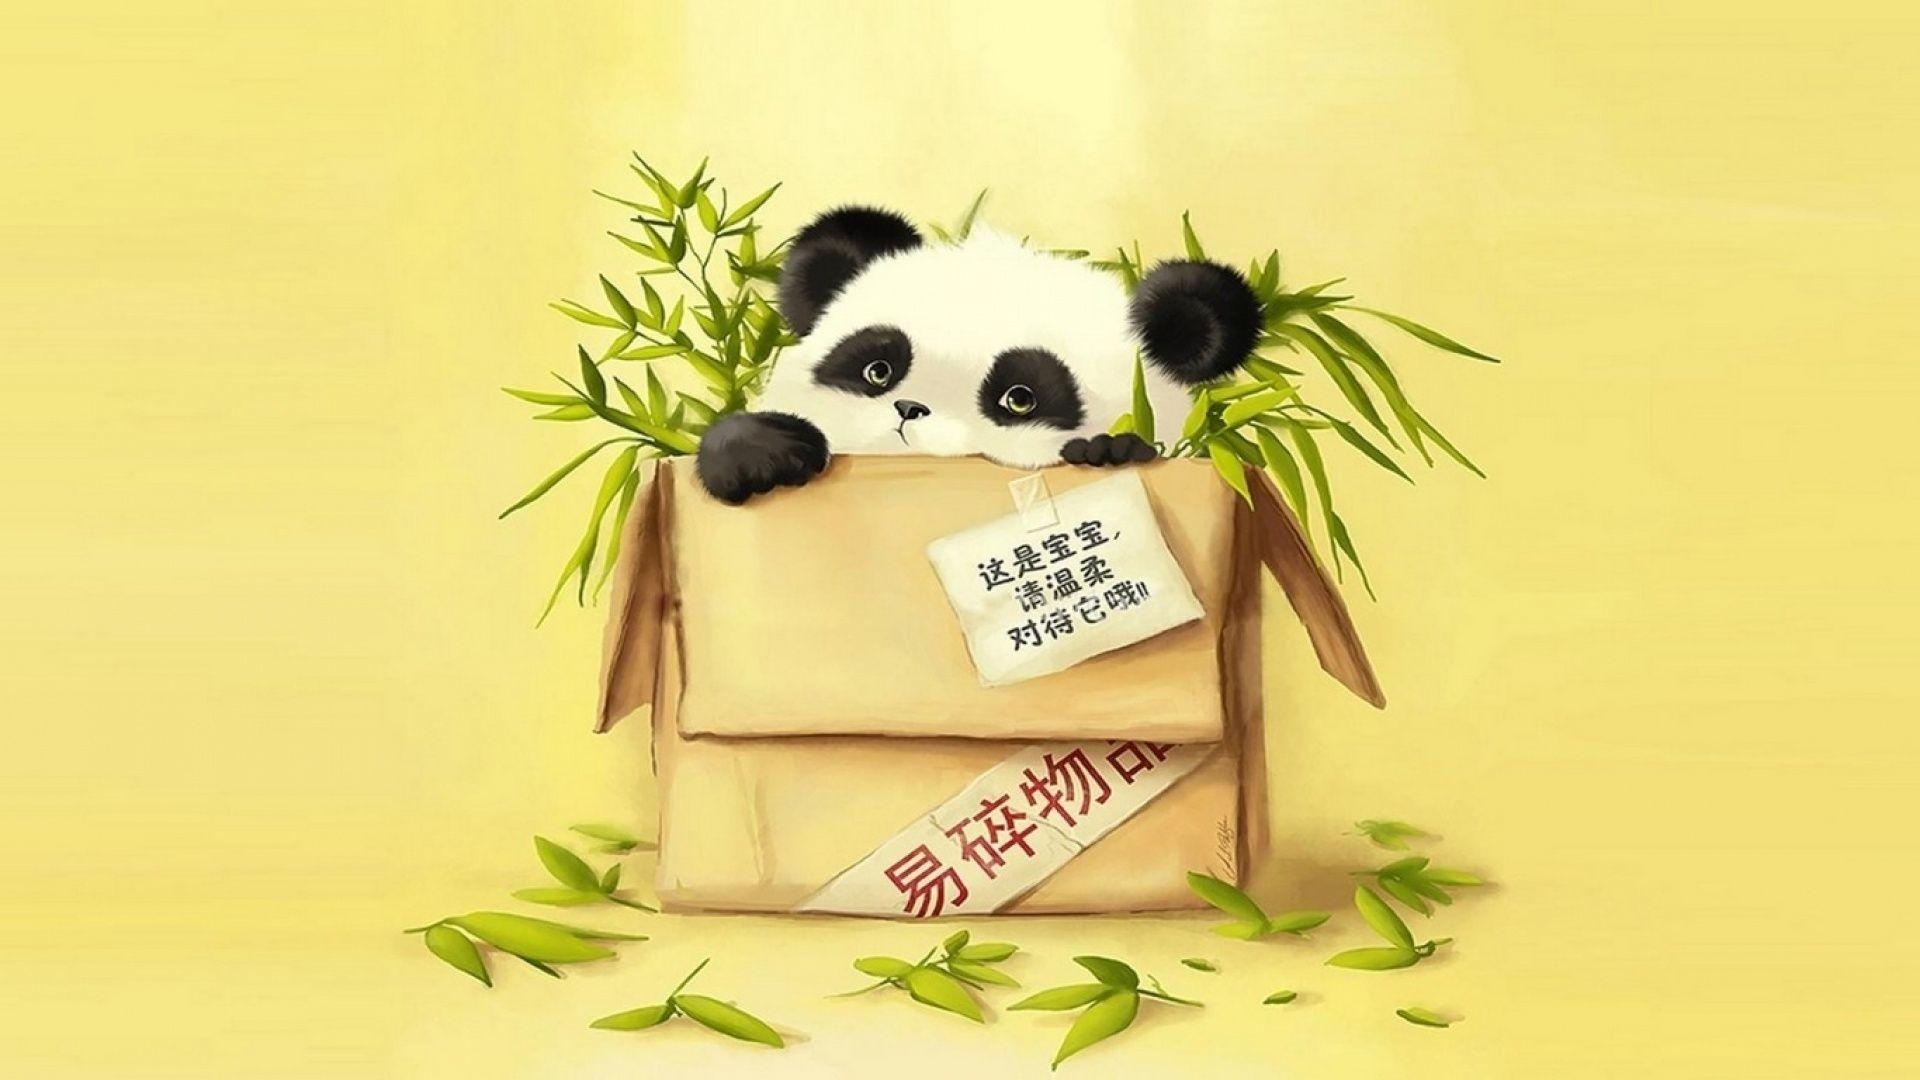 Cartoon Panda Wallpapers – Wallpaper Cave